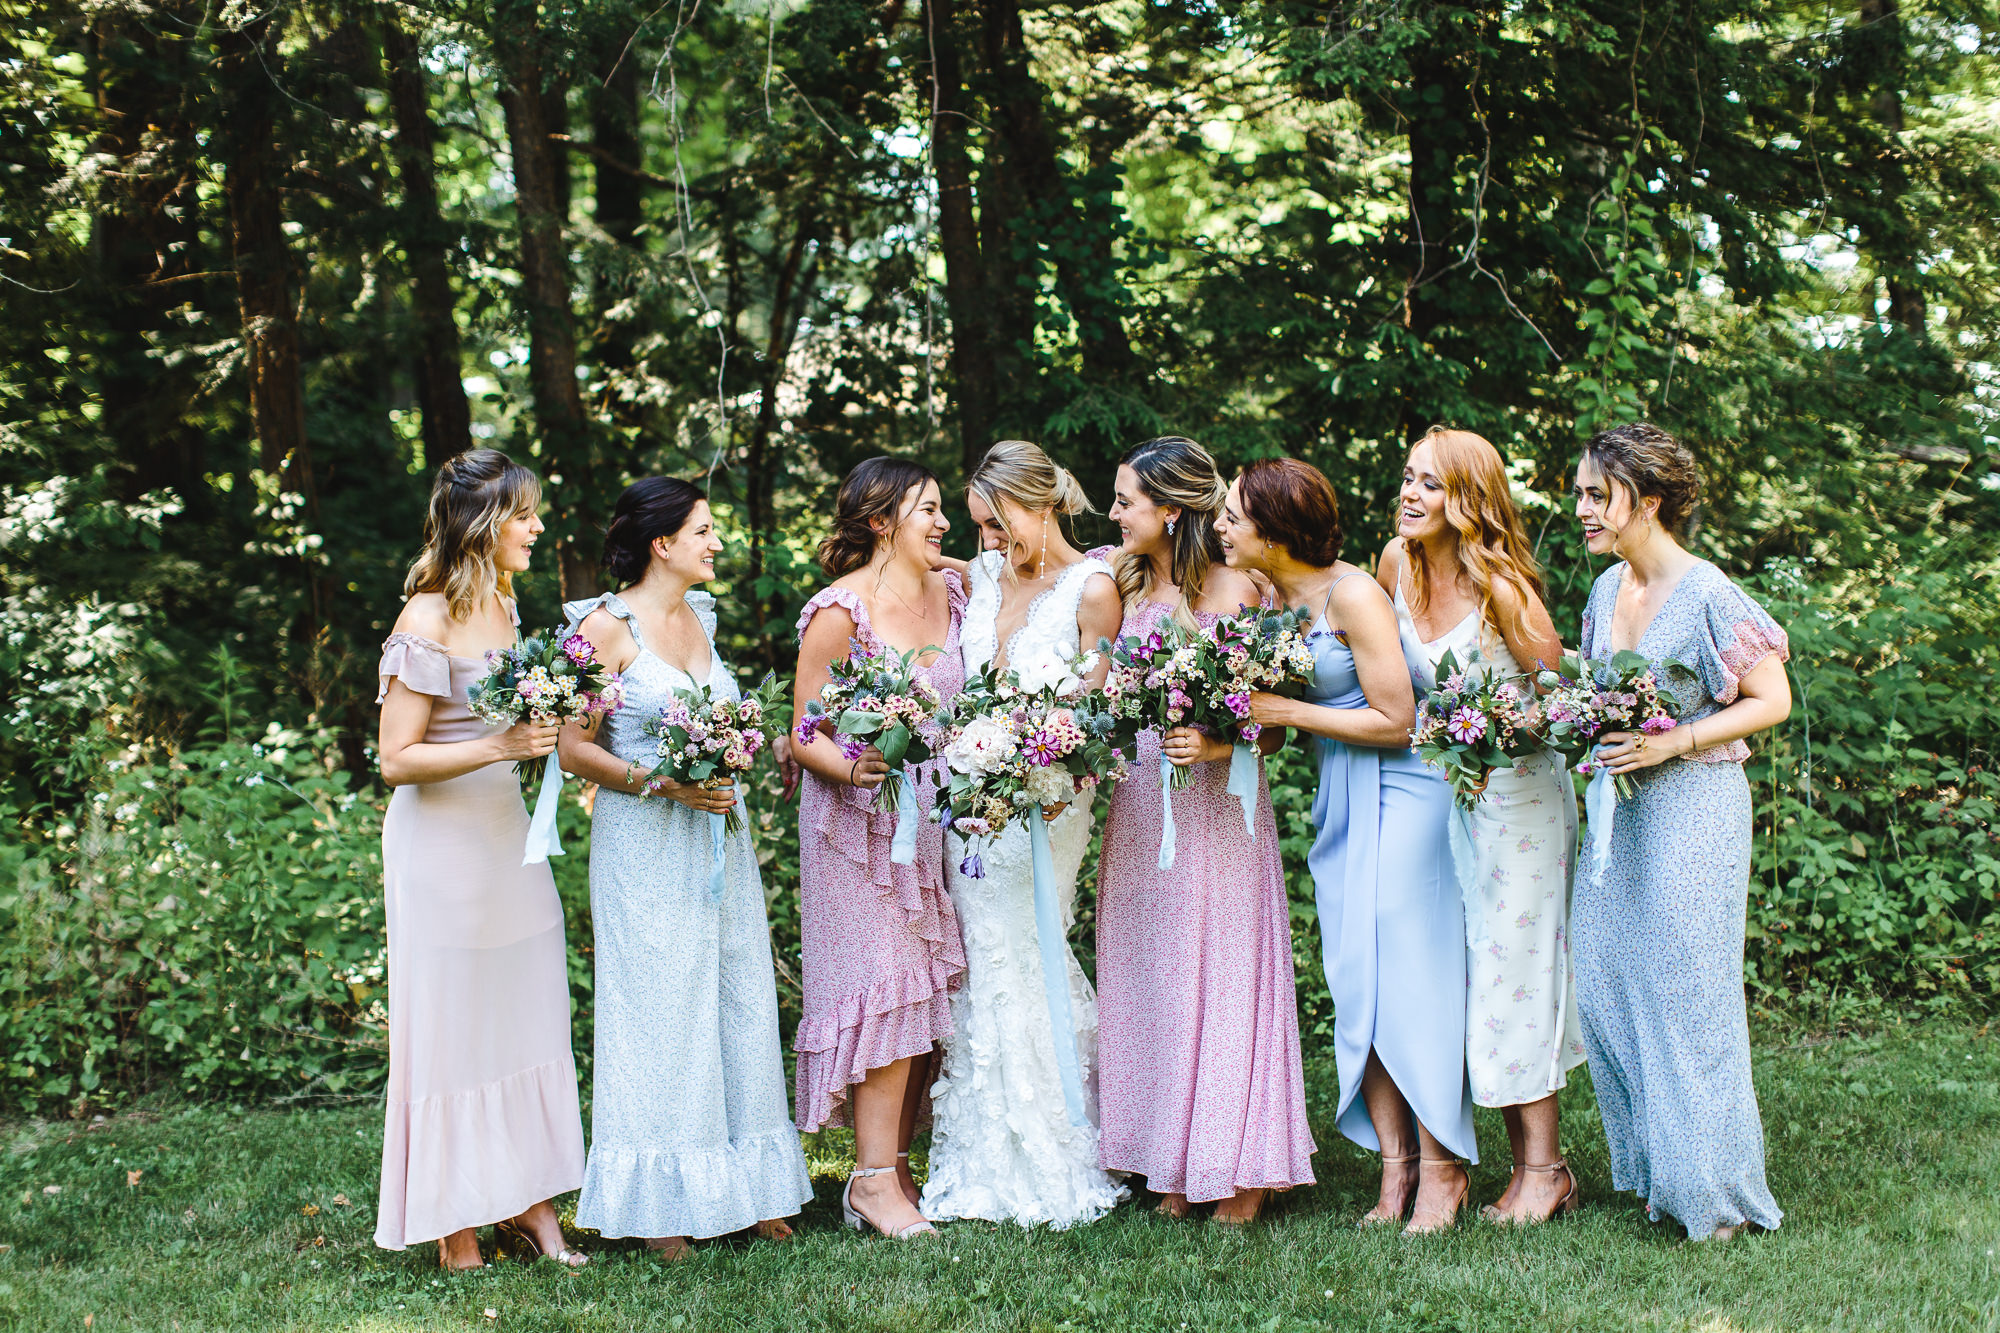 connecticut-summer-lake-wedding-emily-kirke-photography-upstyle (74 of 181).jpg